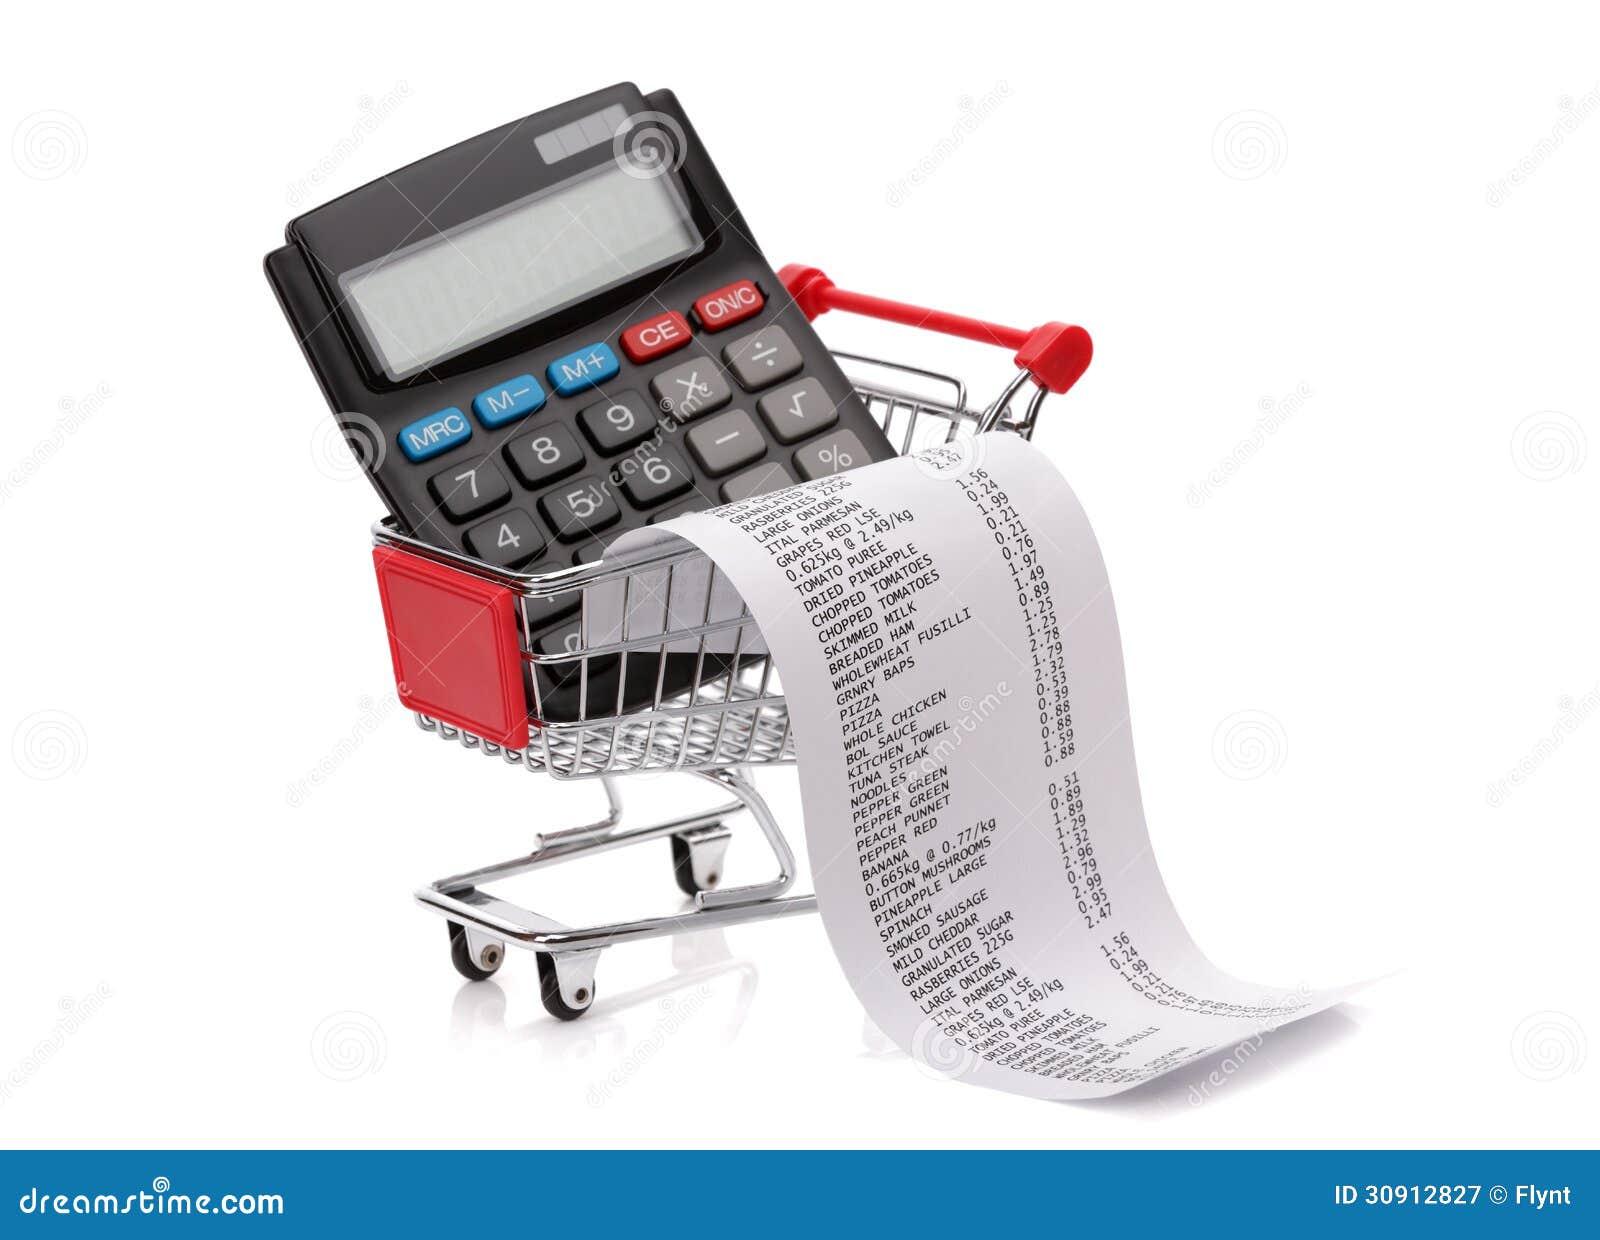 shopping till receipt  calculator and cart royalty free